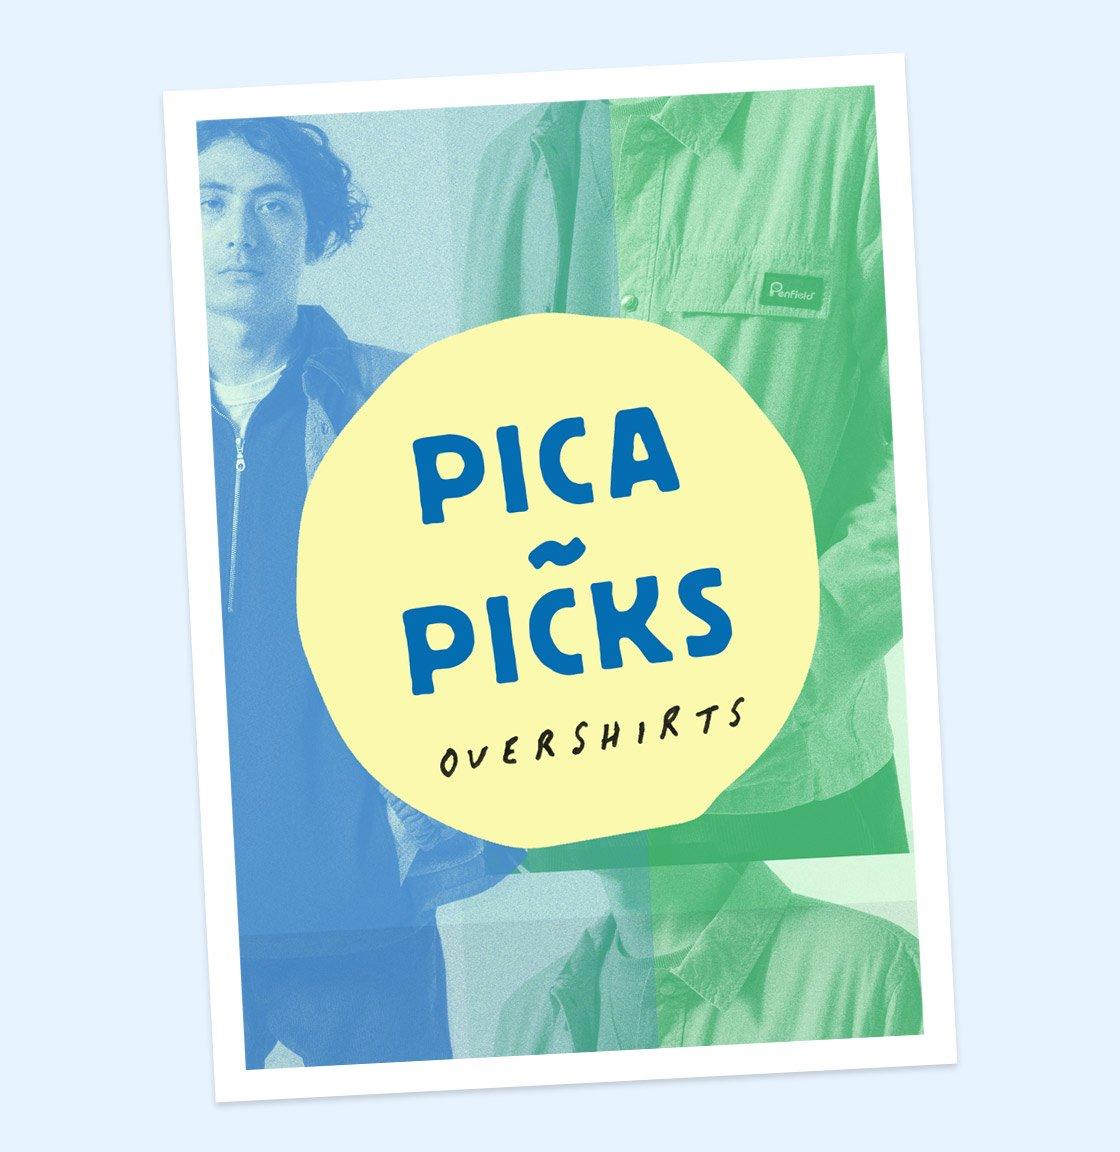 Pica~Picks: Overshirts